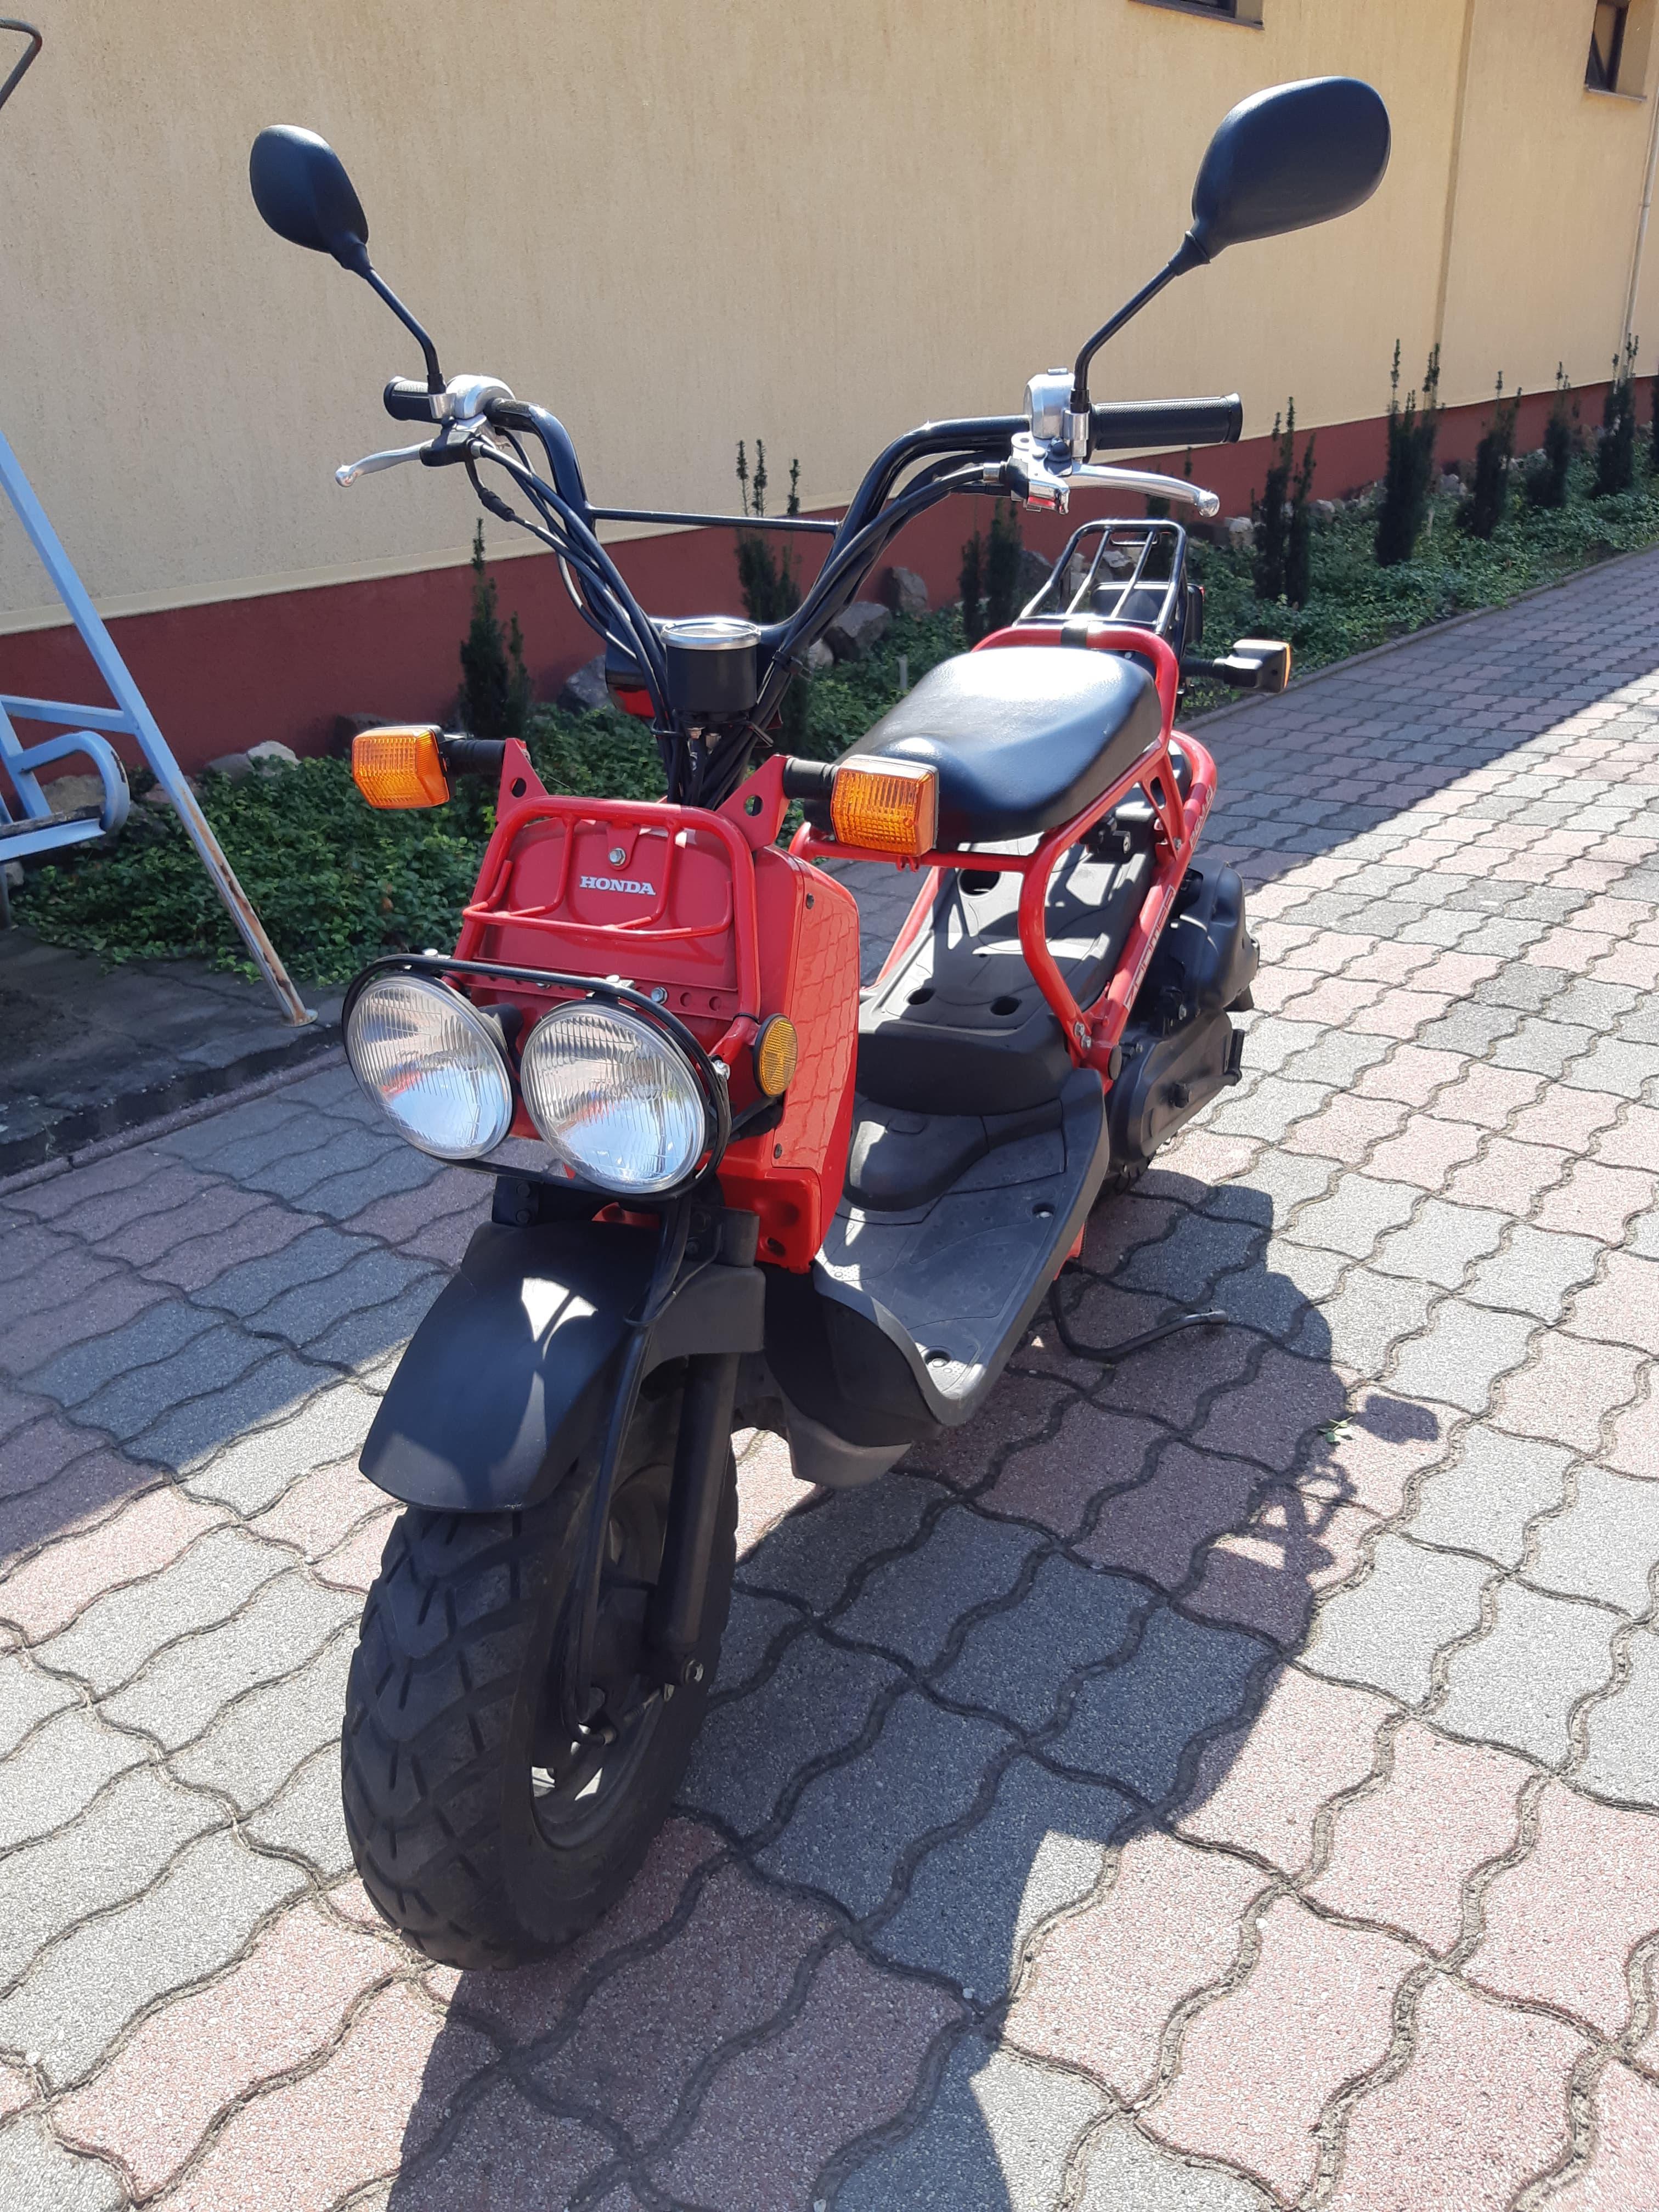 Piaggio NRG MC2 extreme | motoapro.hu - Apróhirdetés